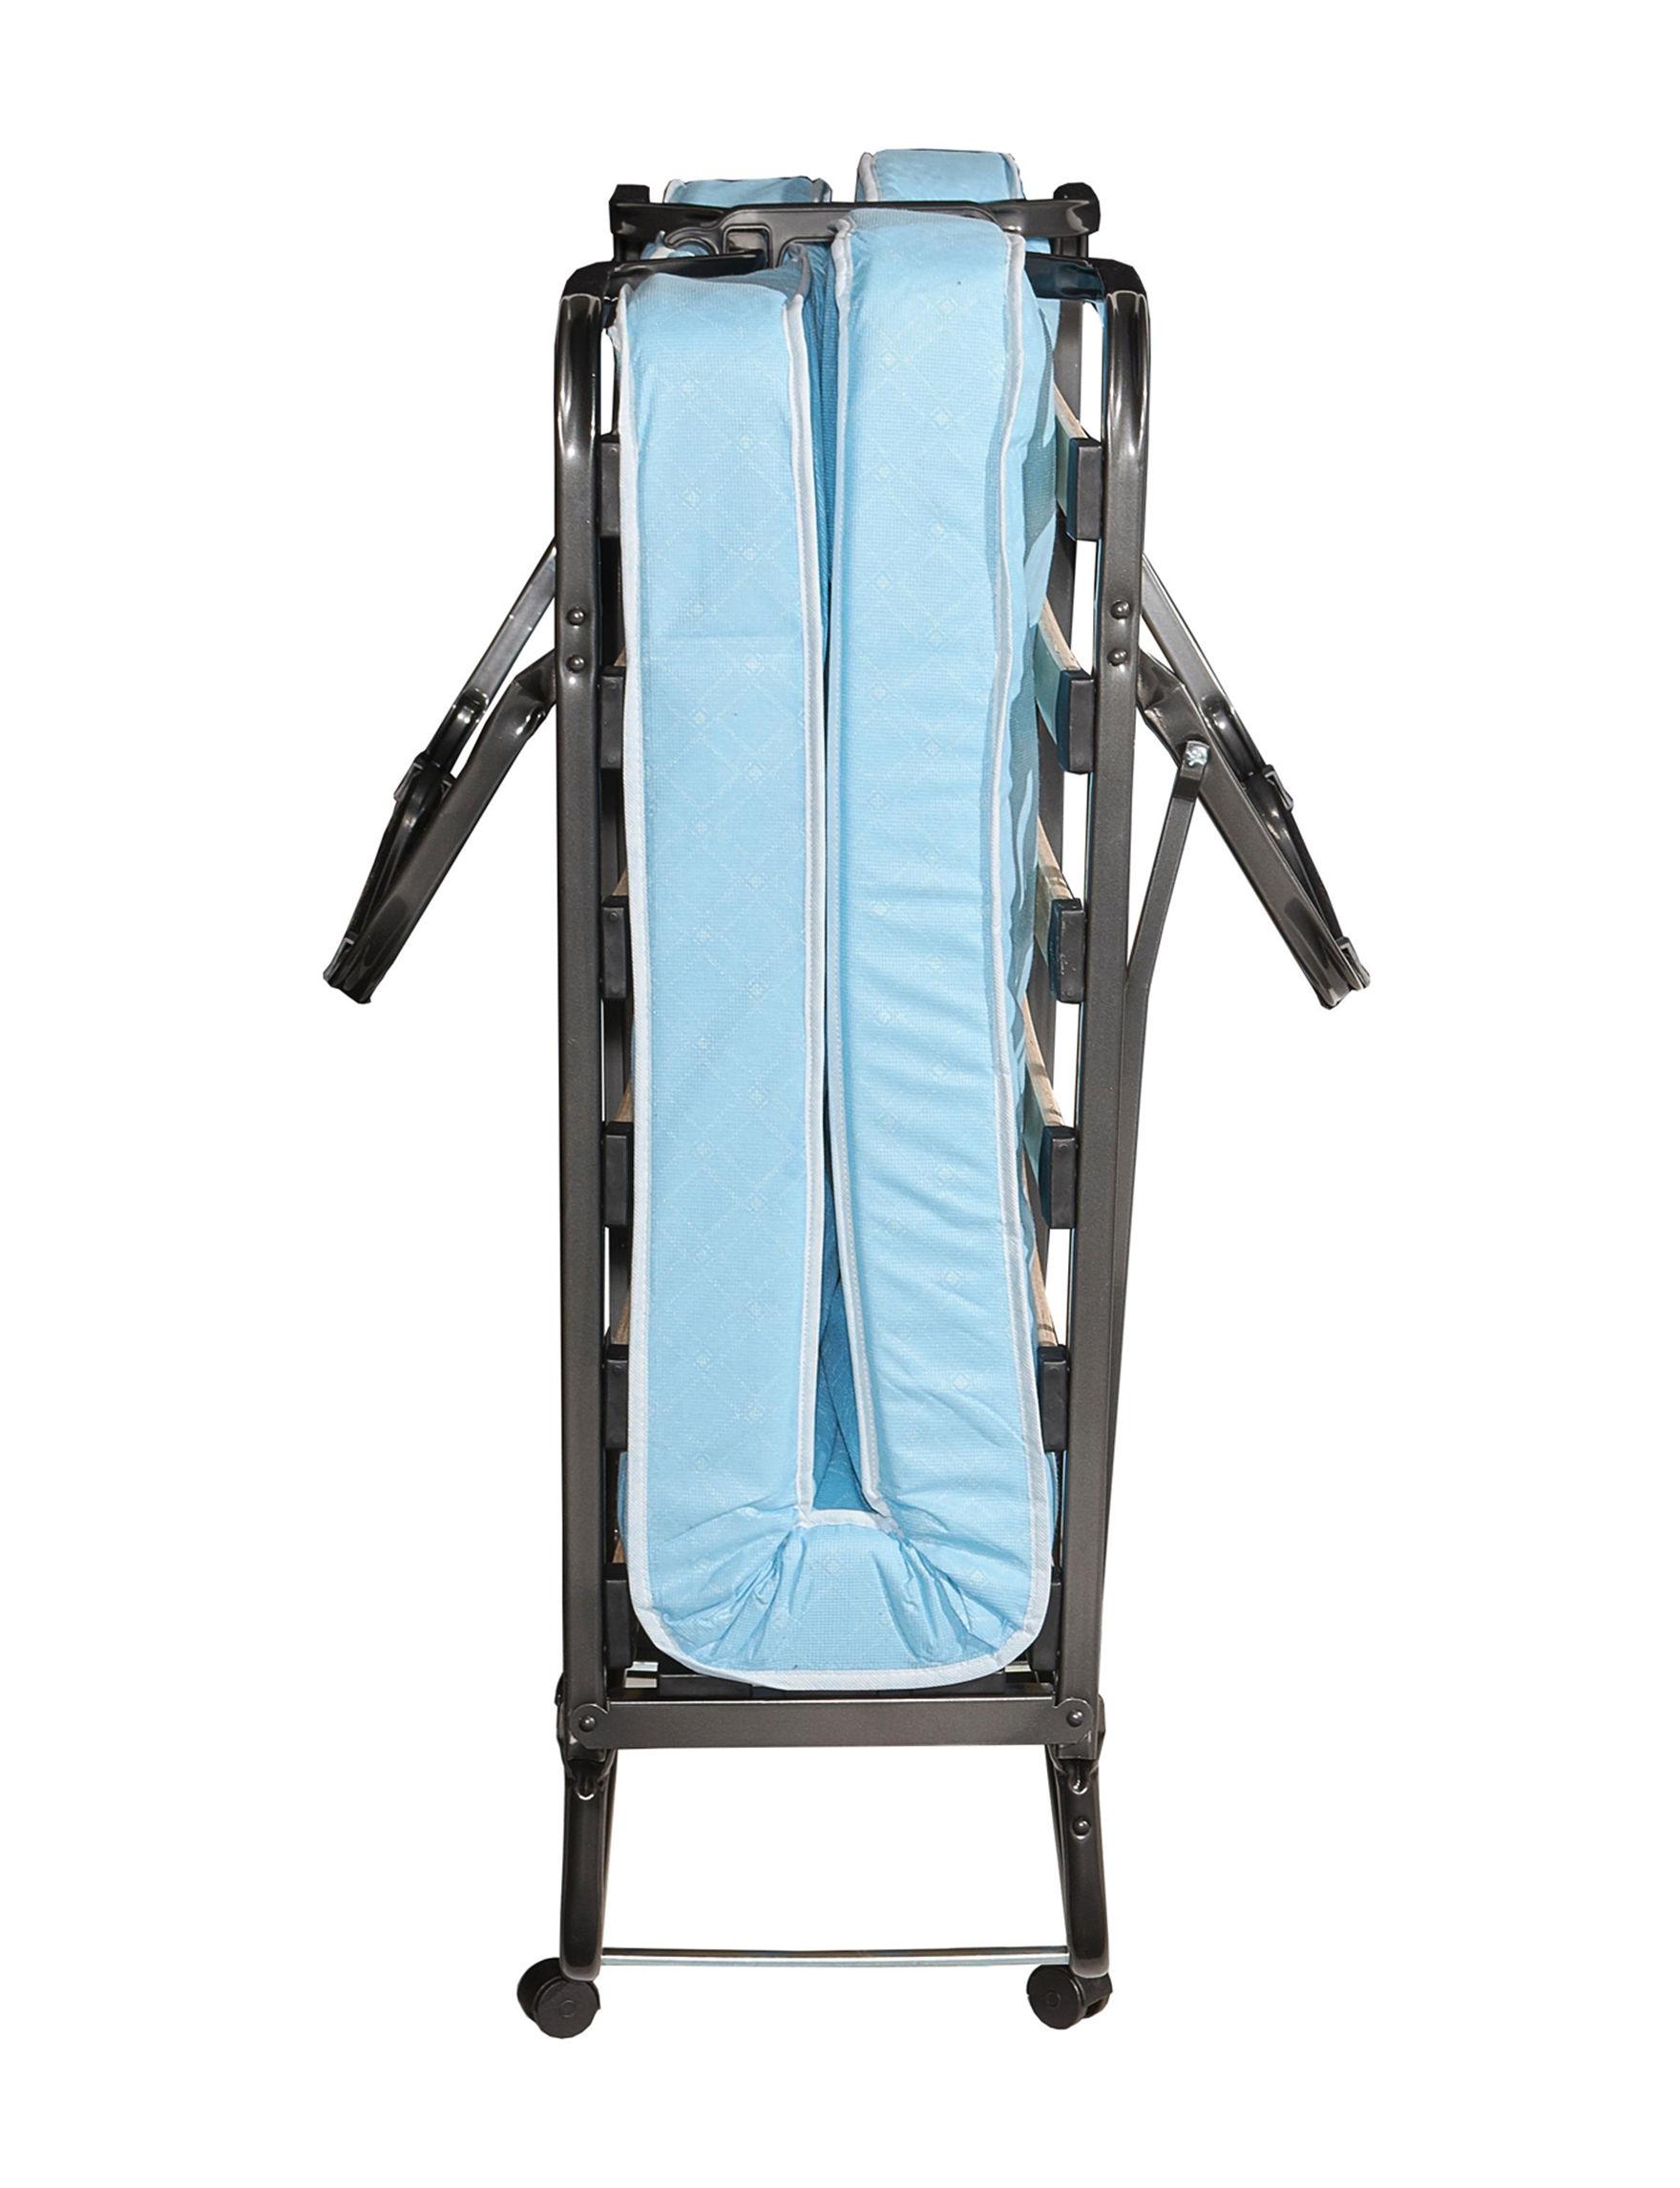 Linon Light Blue Beds & Headboards Bedroom Furniture